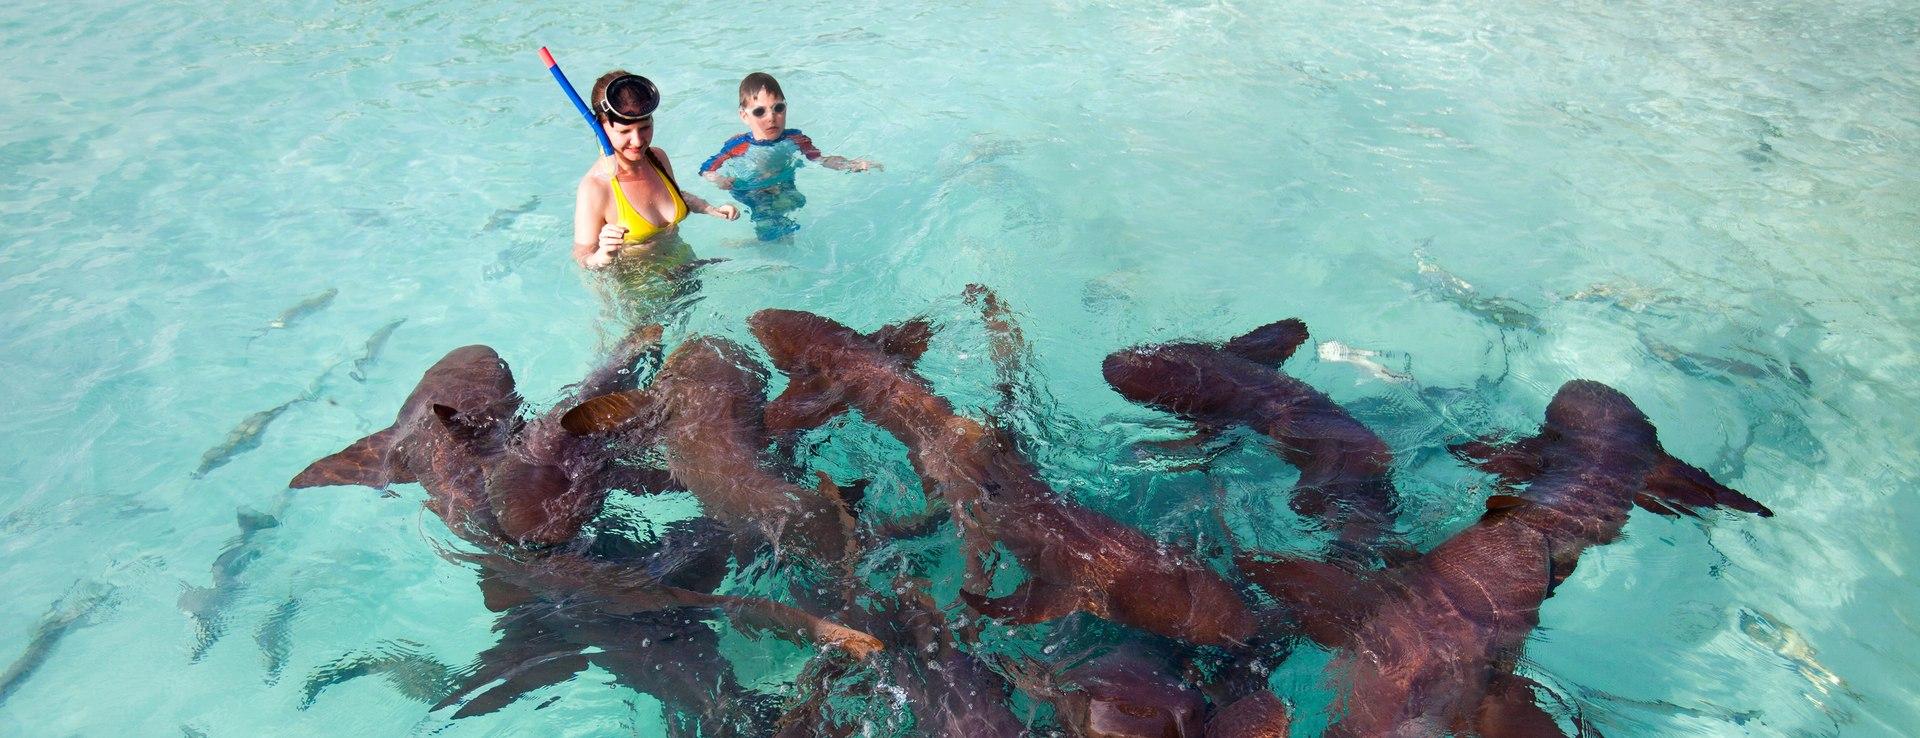 The nurse sharks of Compass Cay Image 1